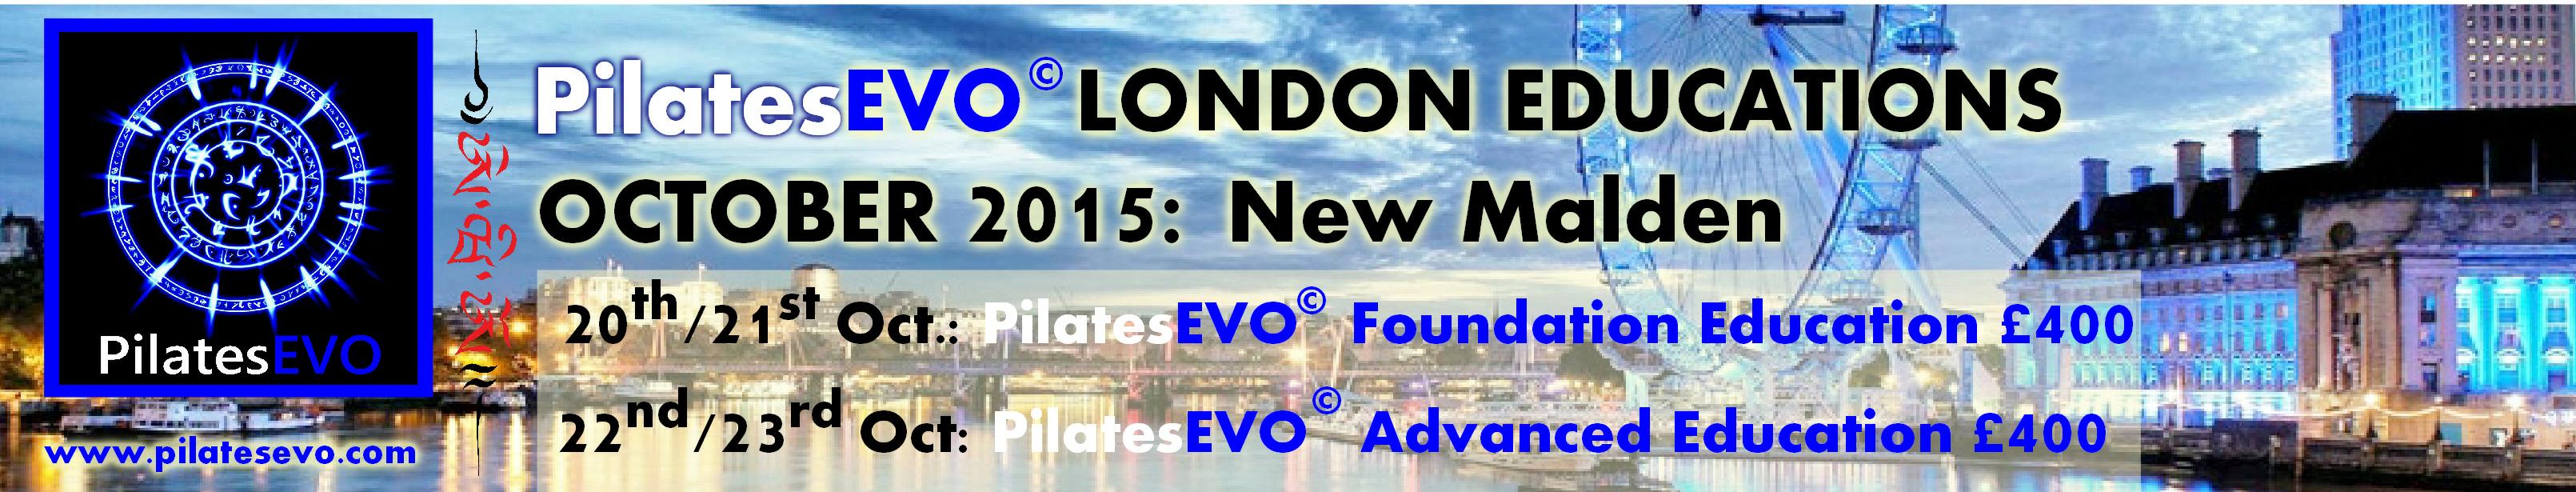 Pilates EVO London Educations